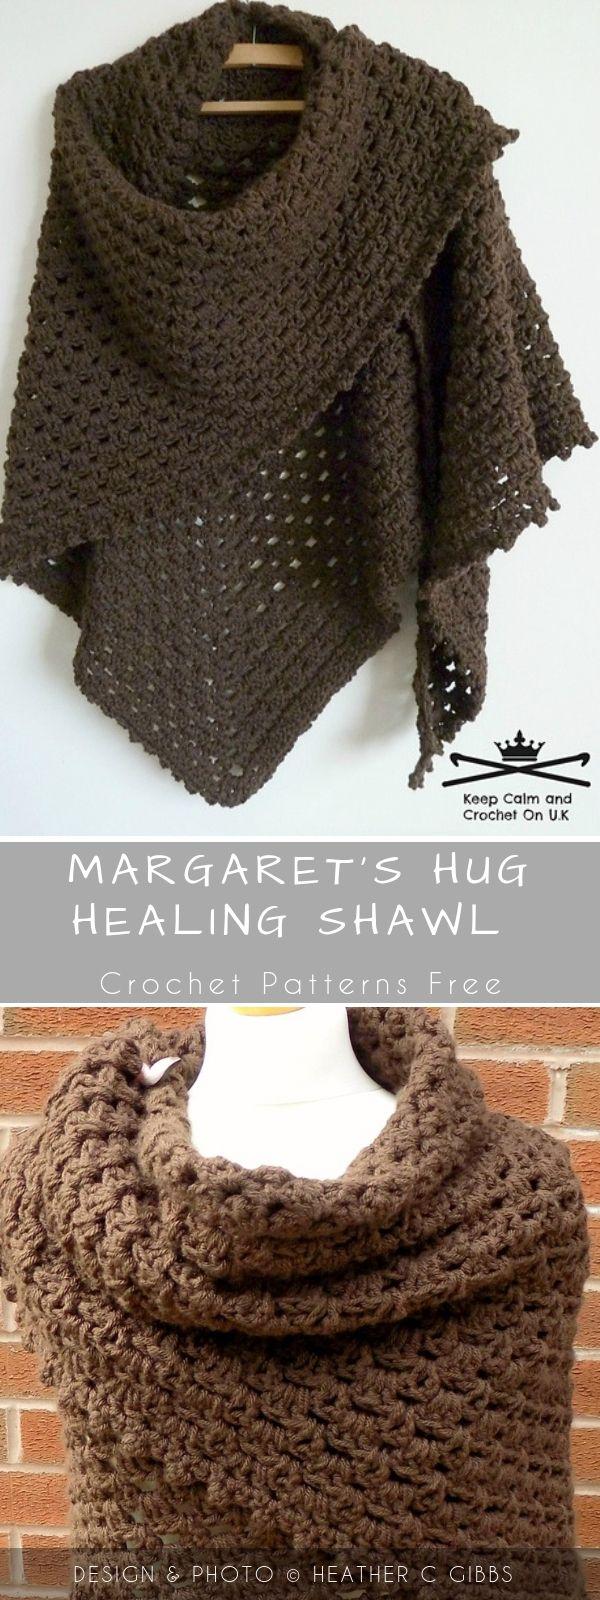 Margaret's Hug Healing Crochet Shawl Wit - Crochet Shawl